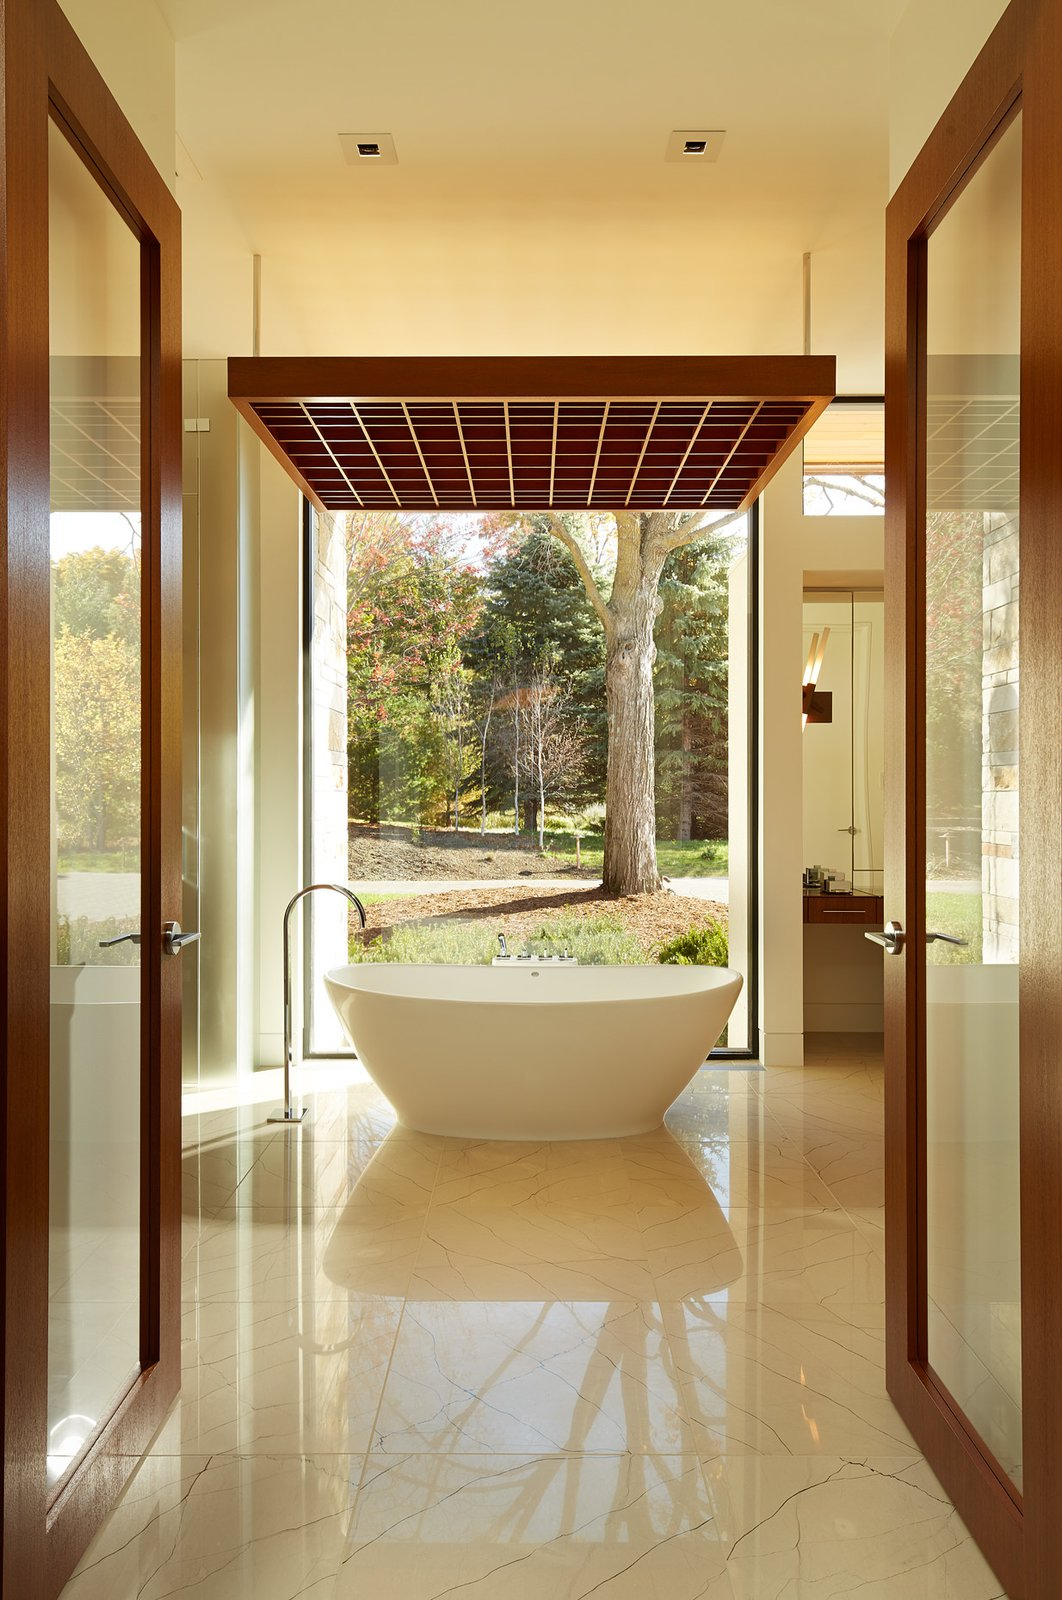 Bath, Freestanding, Wood, Ceramic Tile, Recessed, and Wall  Best Bath Wood Recessed Ceramic Tile Photos from Shoreline Residence